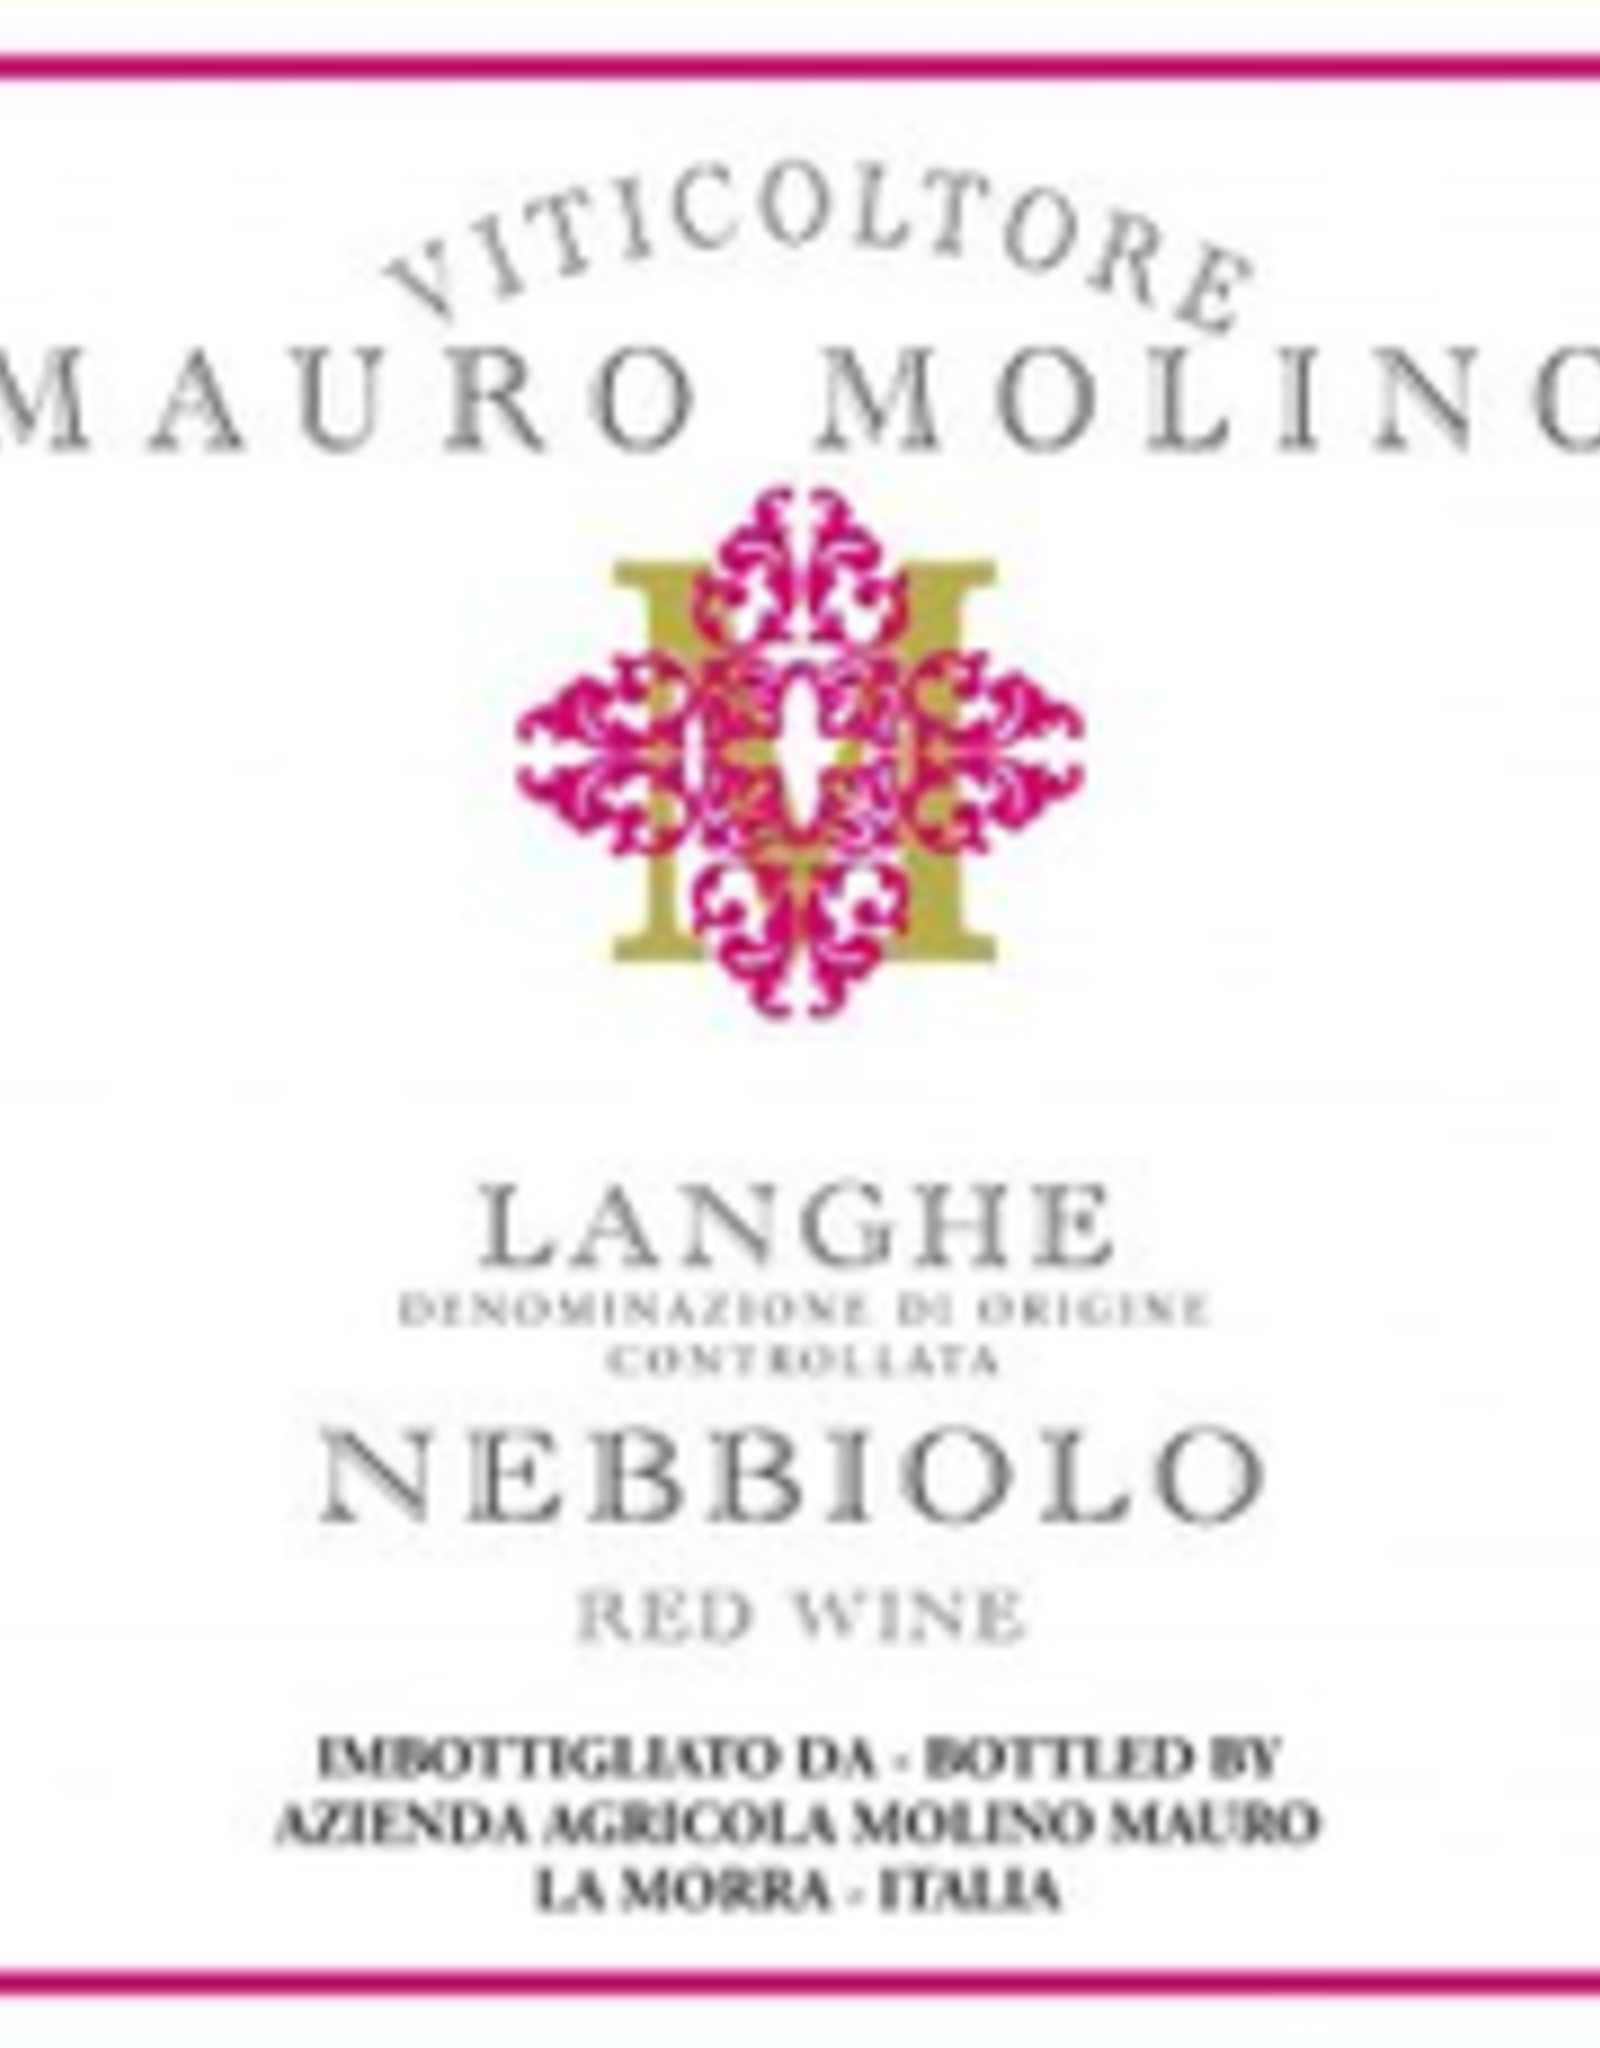 Nebbiolo, Langhe, Mauro Molino 2019